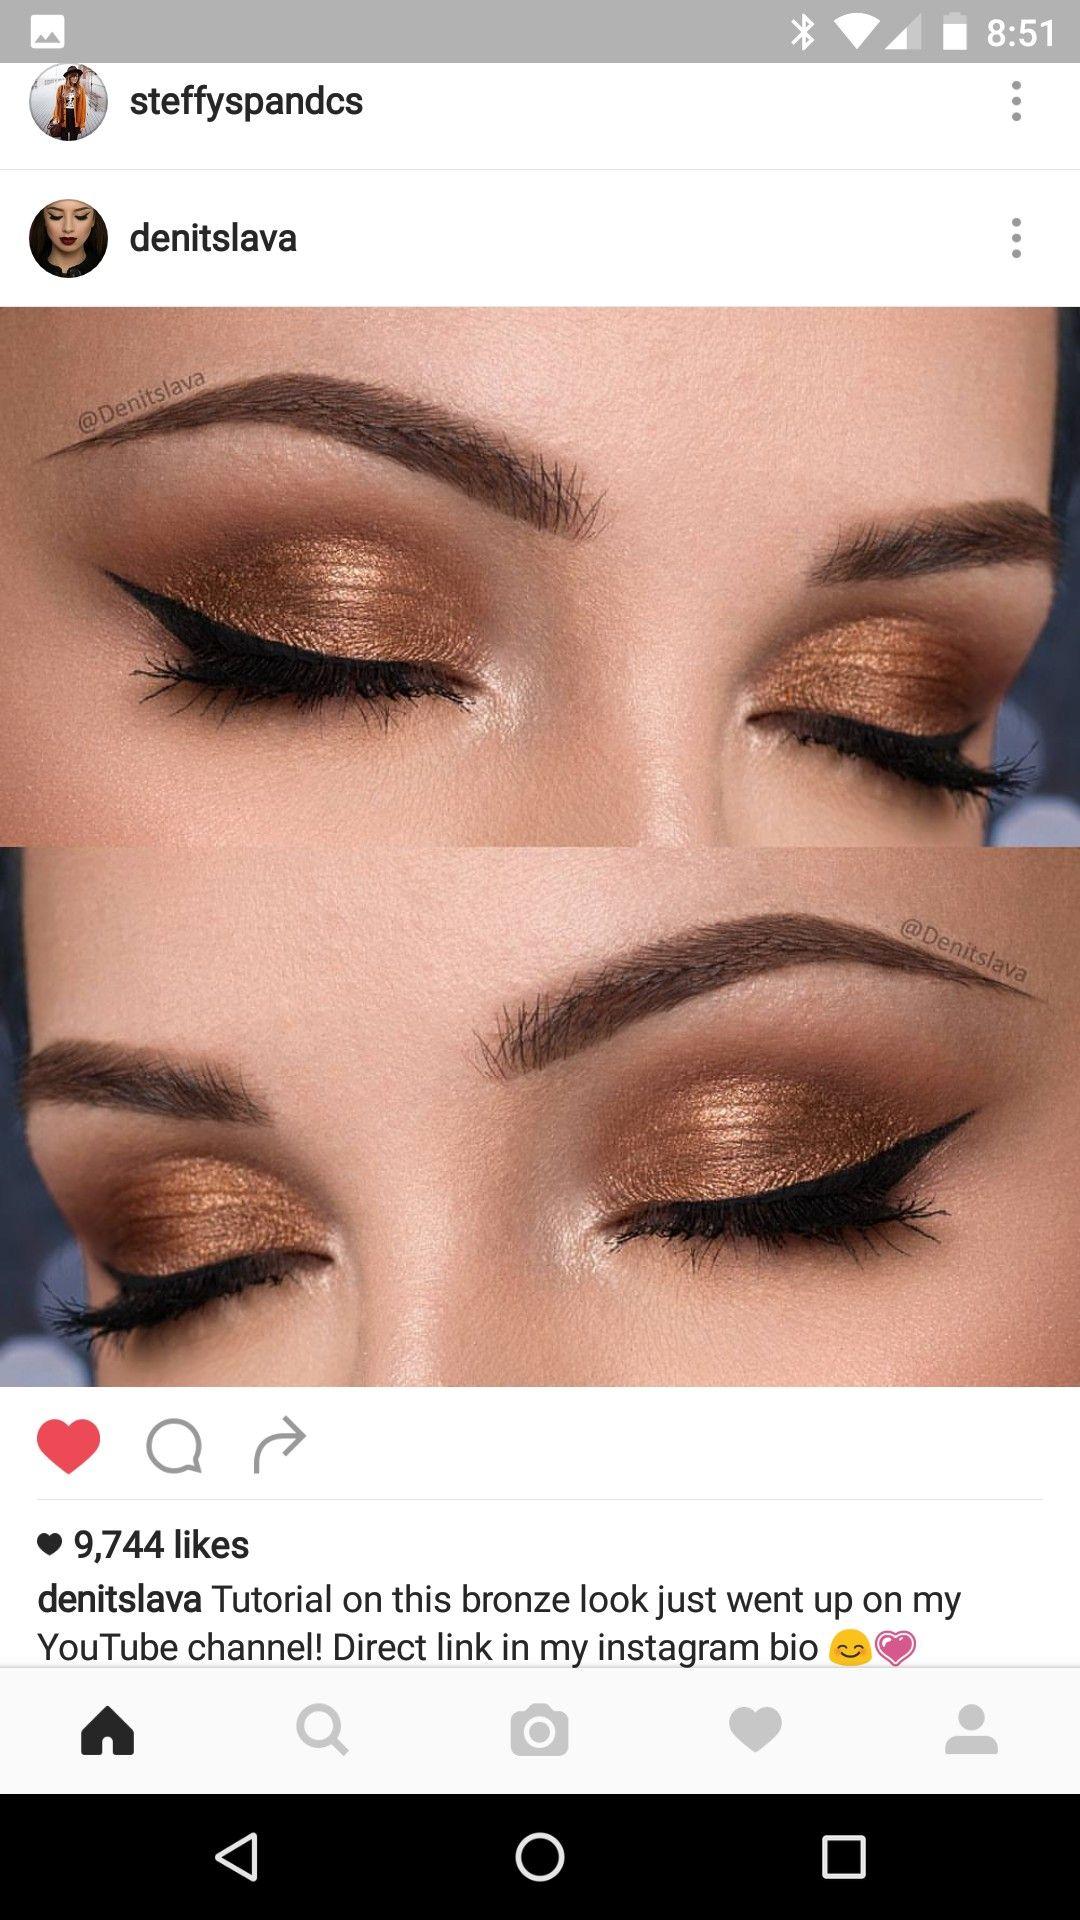 Pin by naomi benatar on makeup 3 pinterest make up find this pin and more on makeup 3 by naomibenatar baditri Choice Image